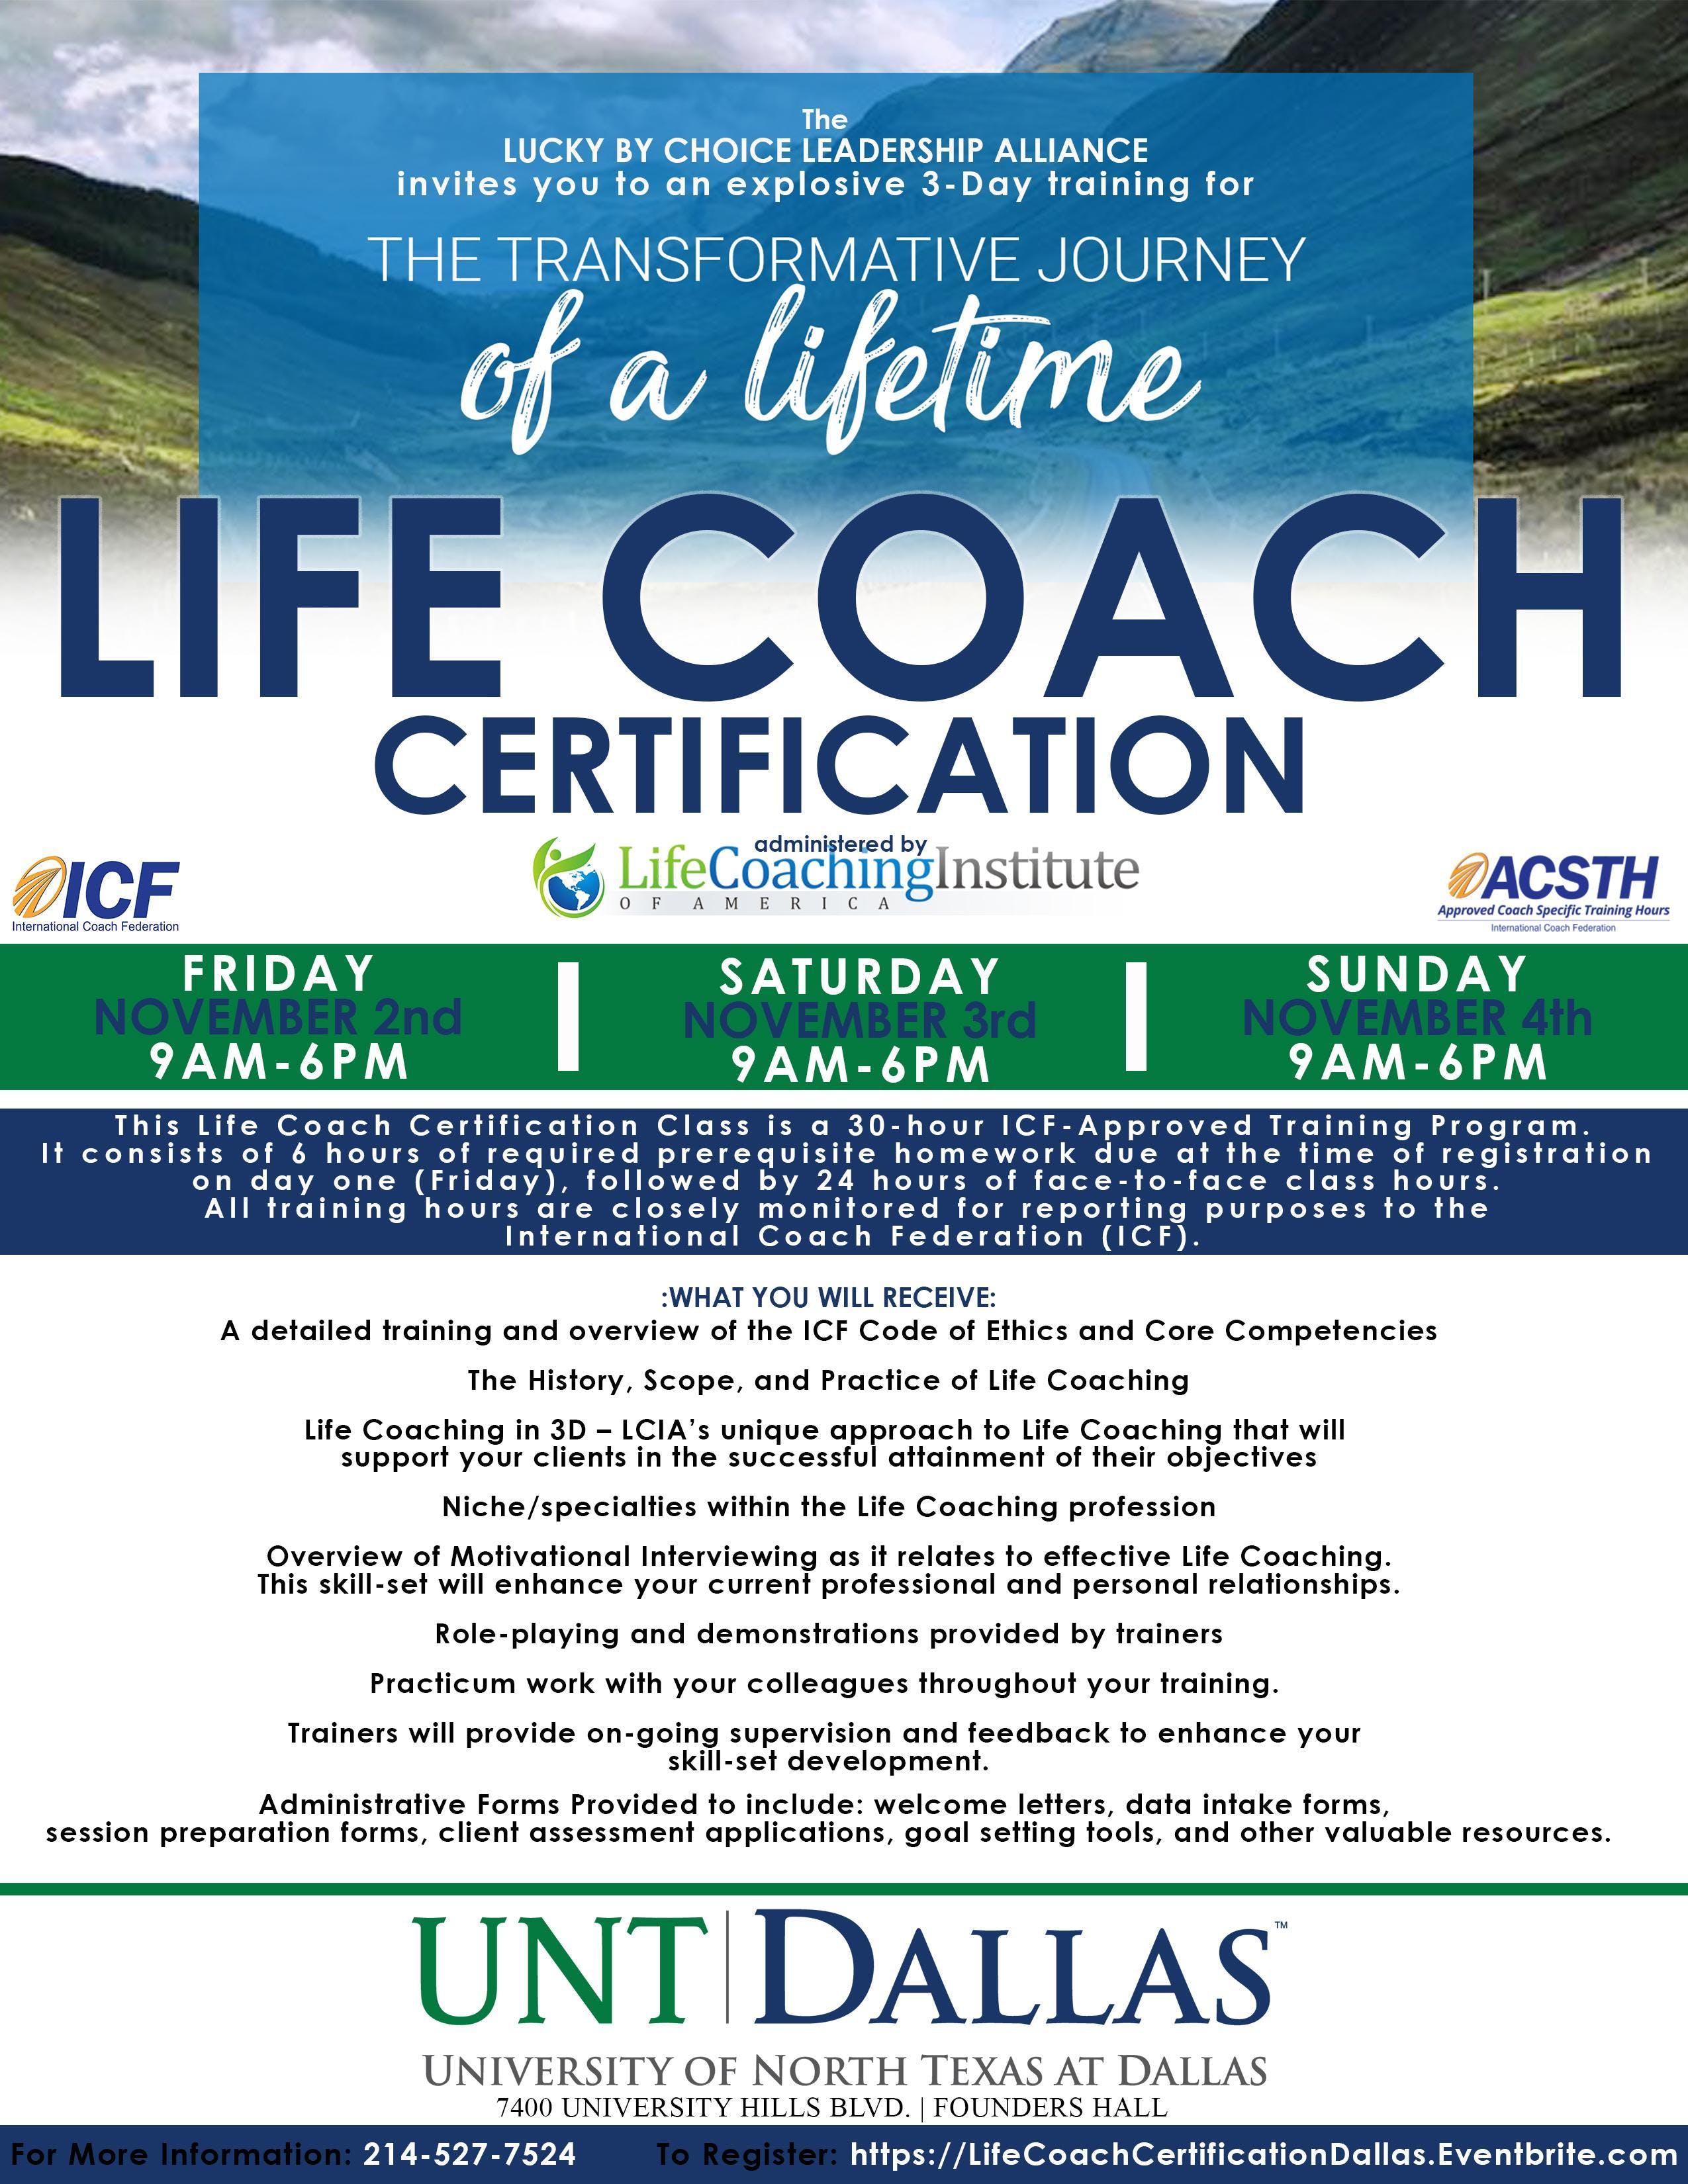 Life Coach Certification At University Of North Texas Dallas Dallas